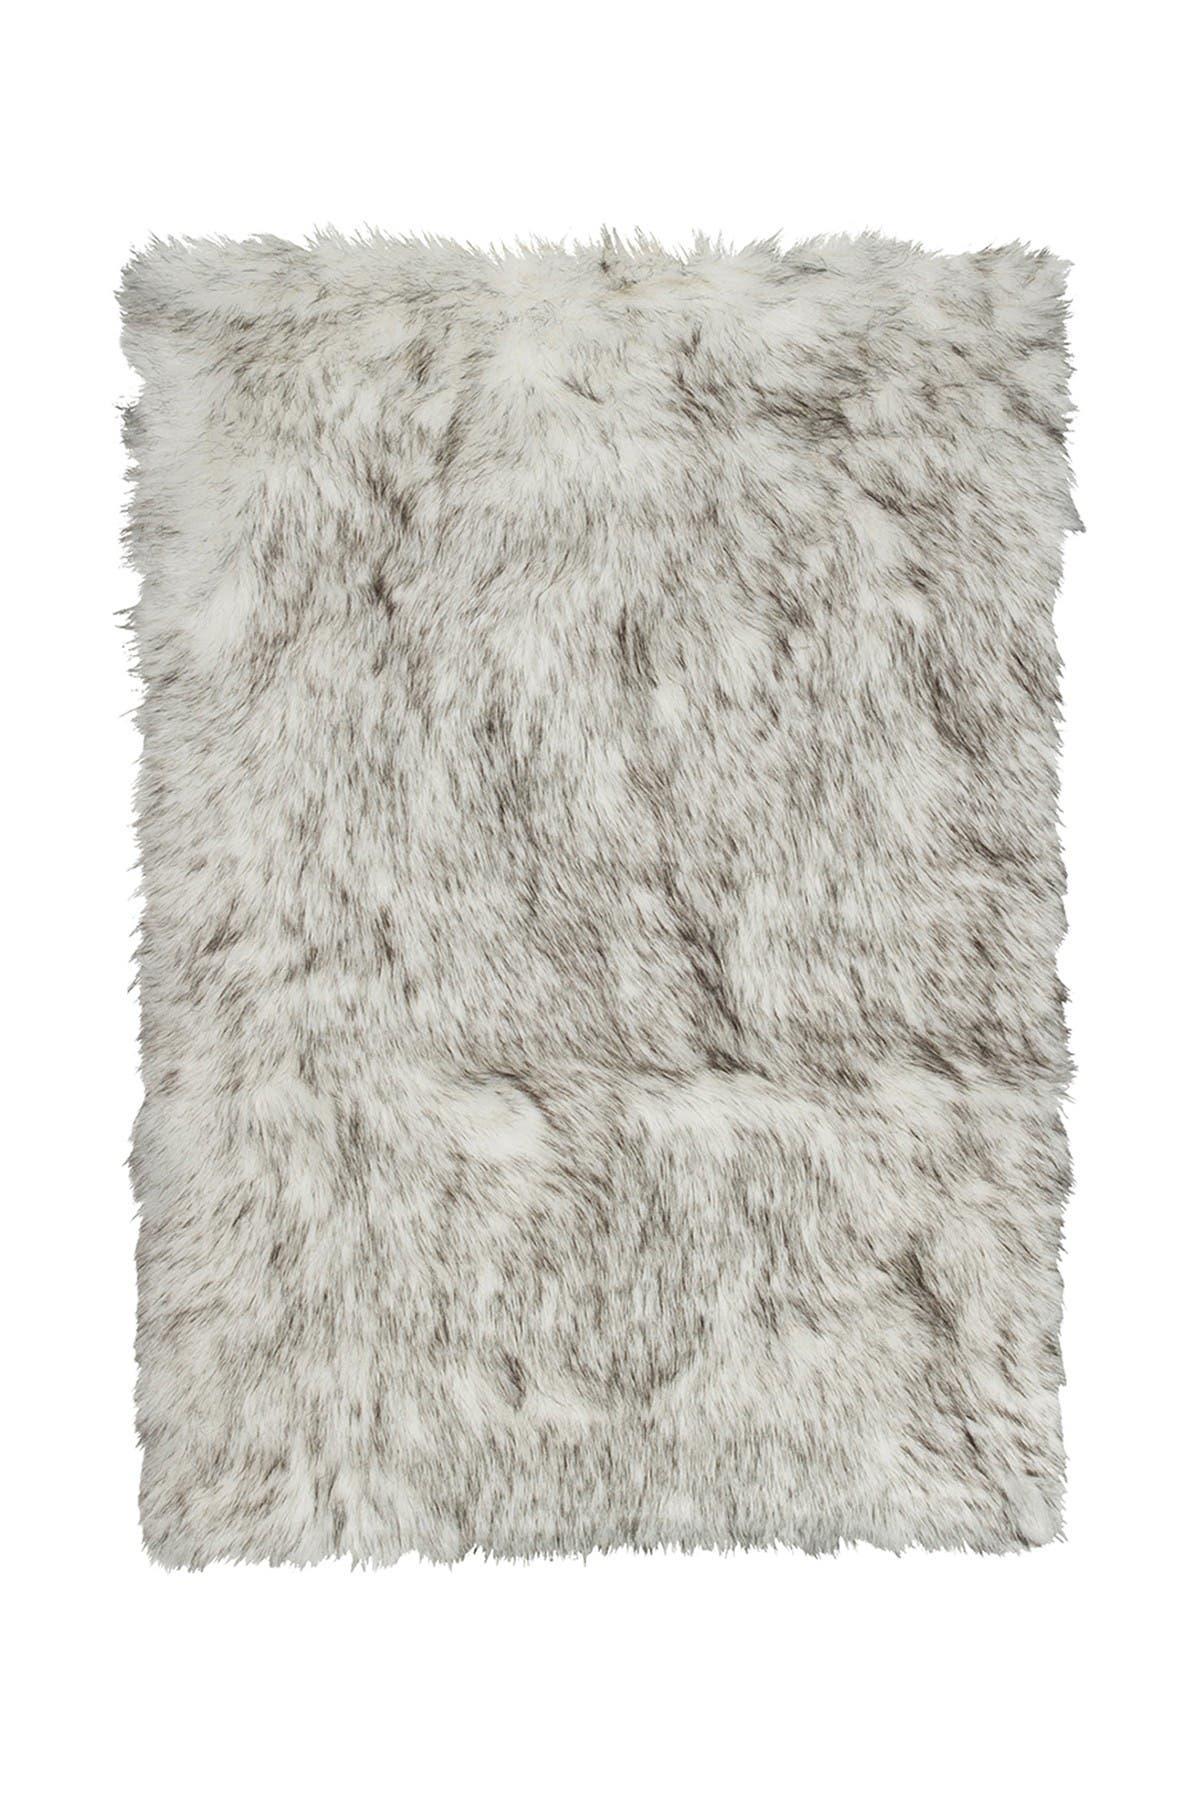 Image of LUXE Faux Fur Hudson Rectangular Rug - 2ft x 3ft - Gradient Grey